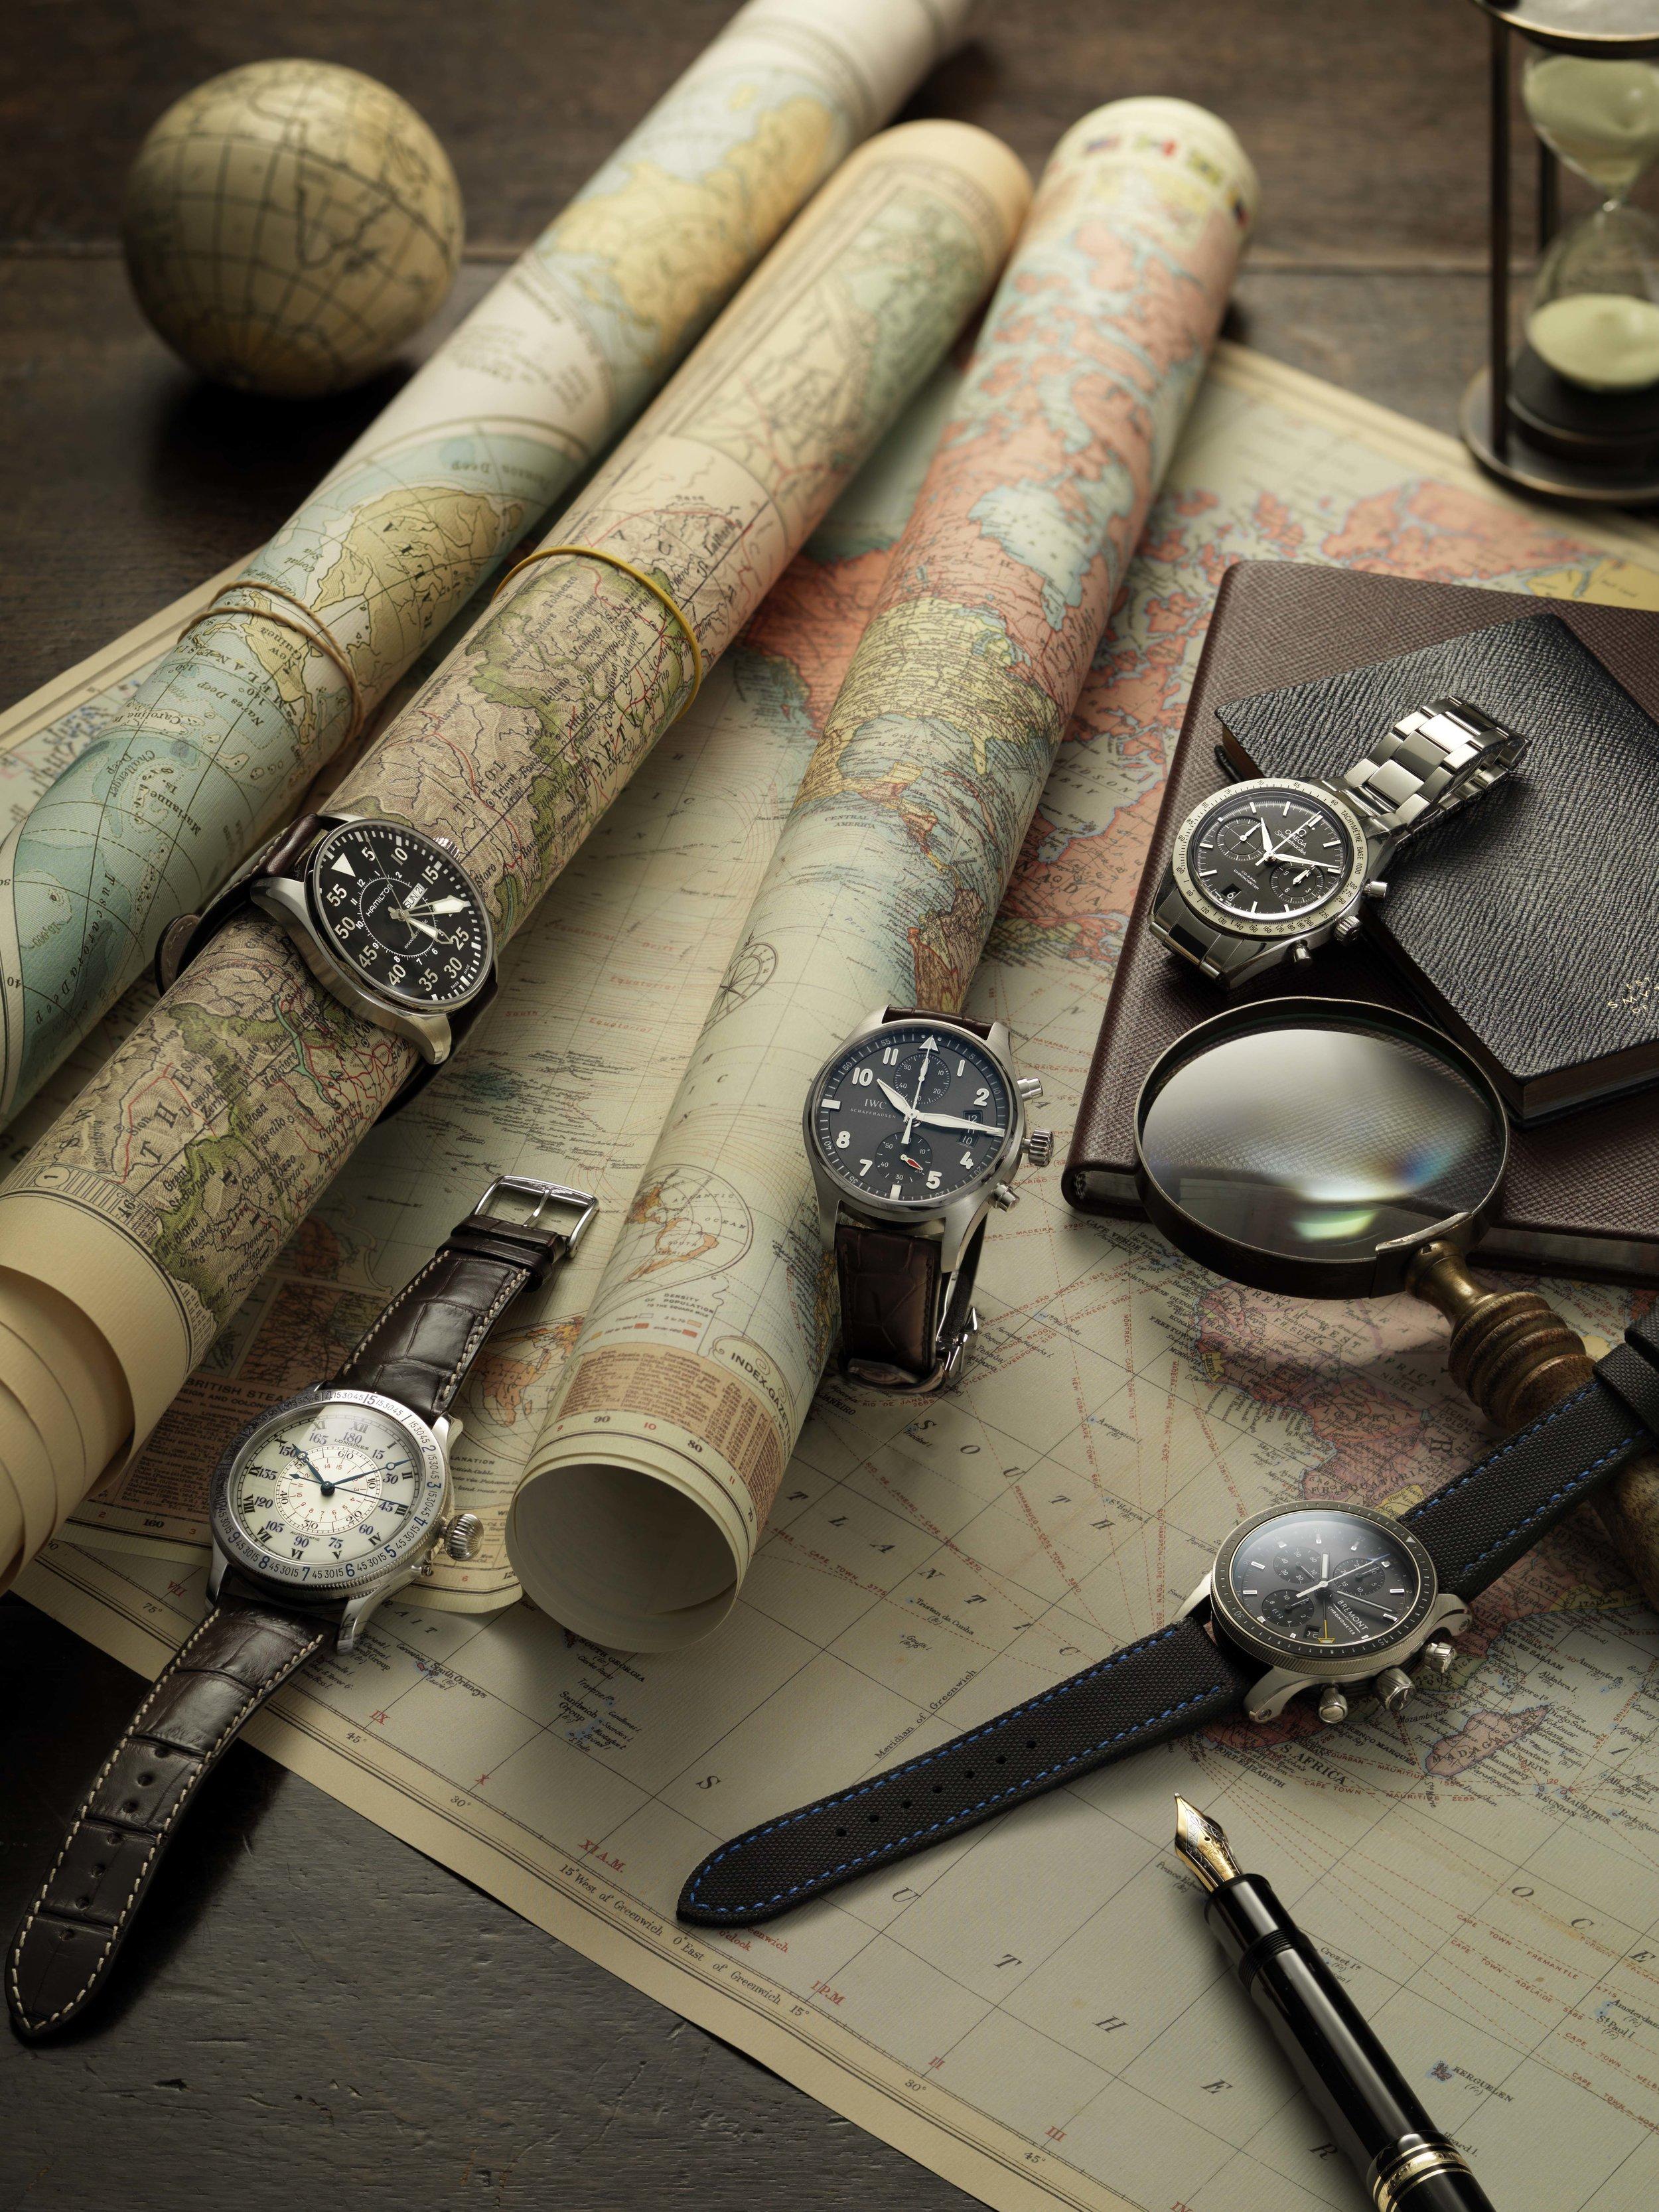 DH&Co-Photography-Still-Life-GJ Autumn Watches1 MASTER.jpg